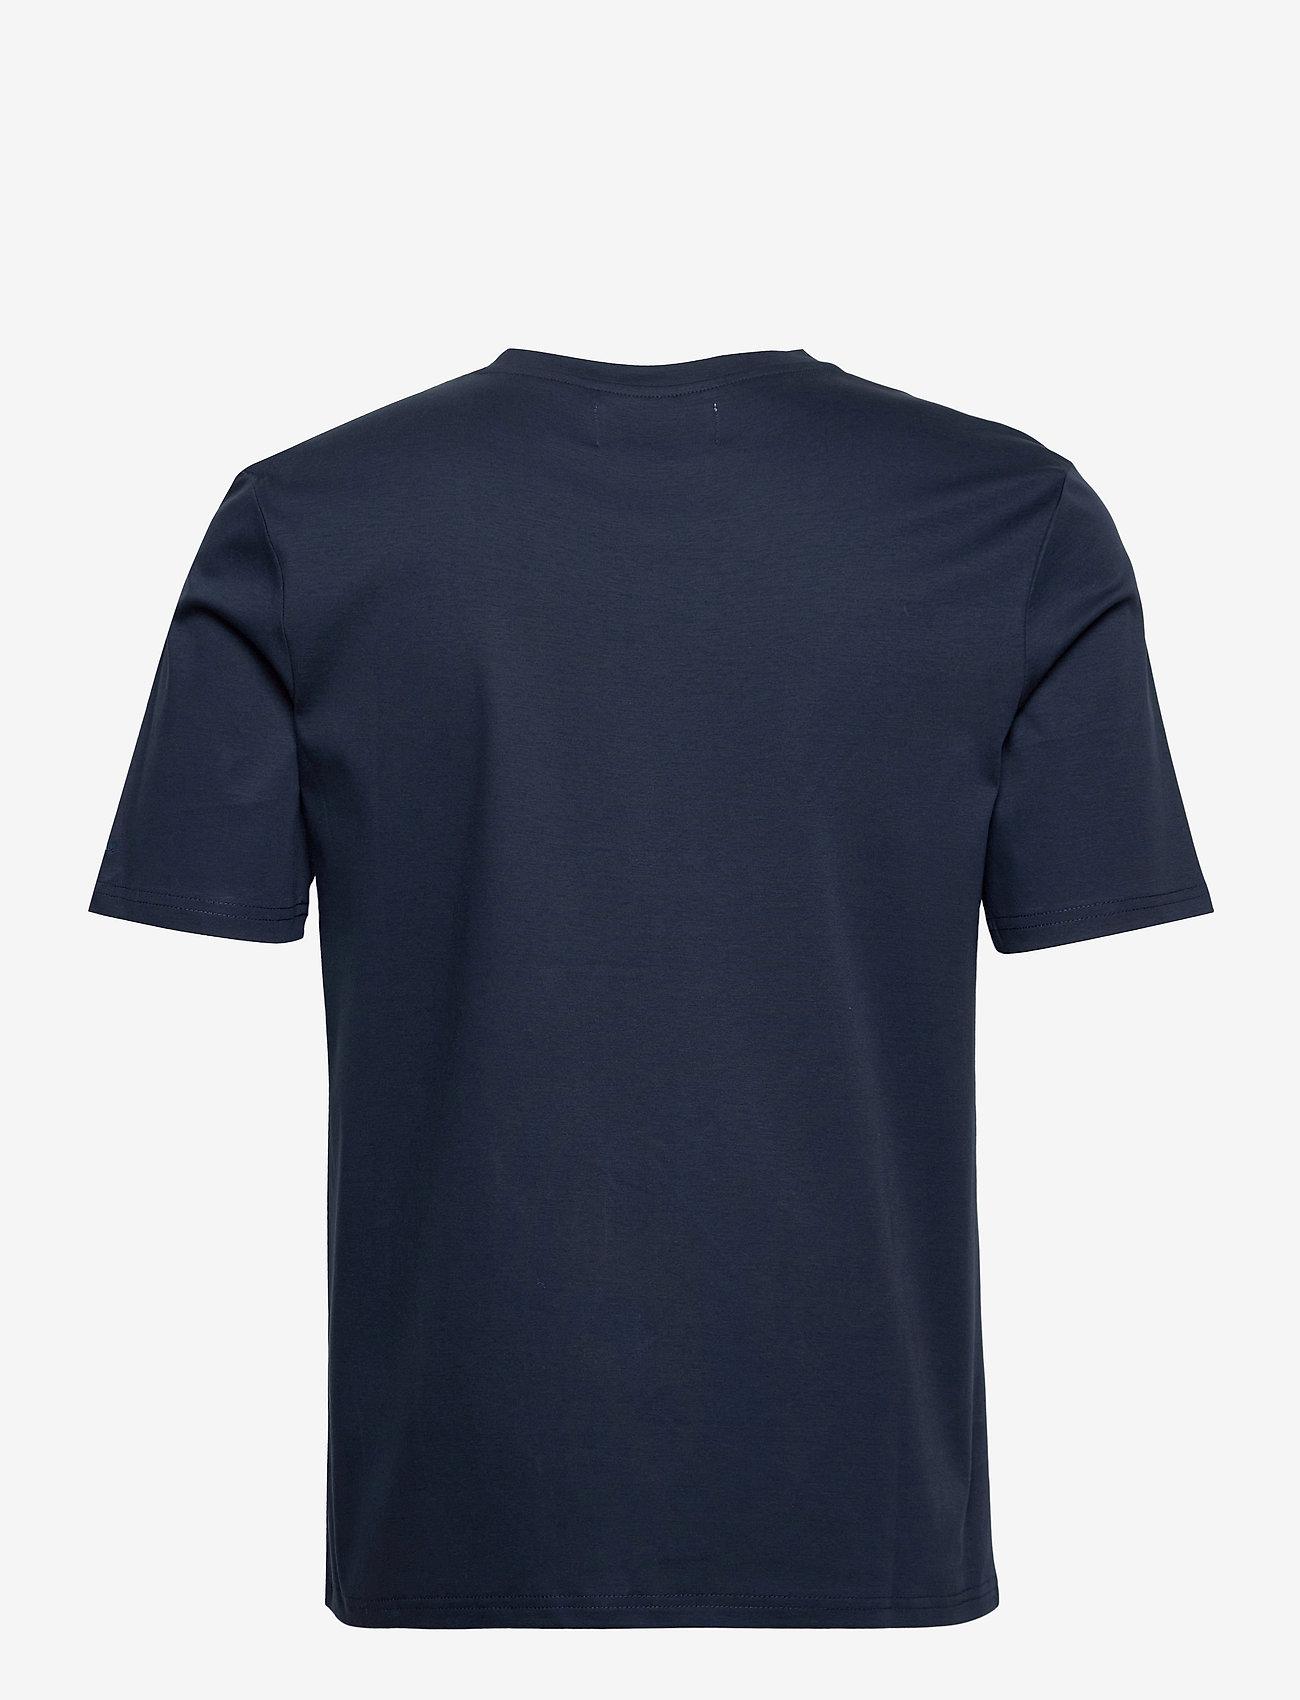 FRAM - Fram Basic Tee - basic t-shirts - sky captain - 1